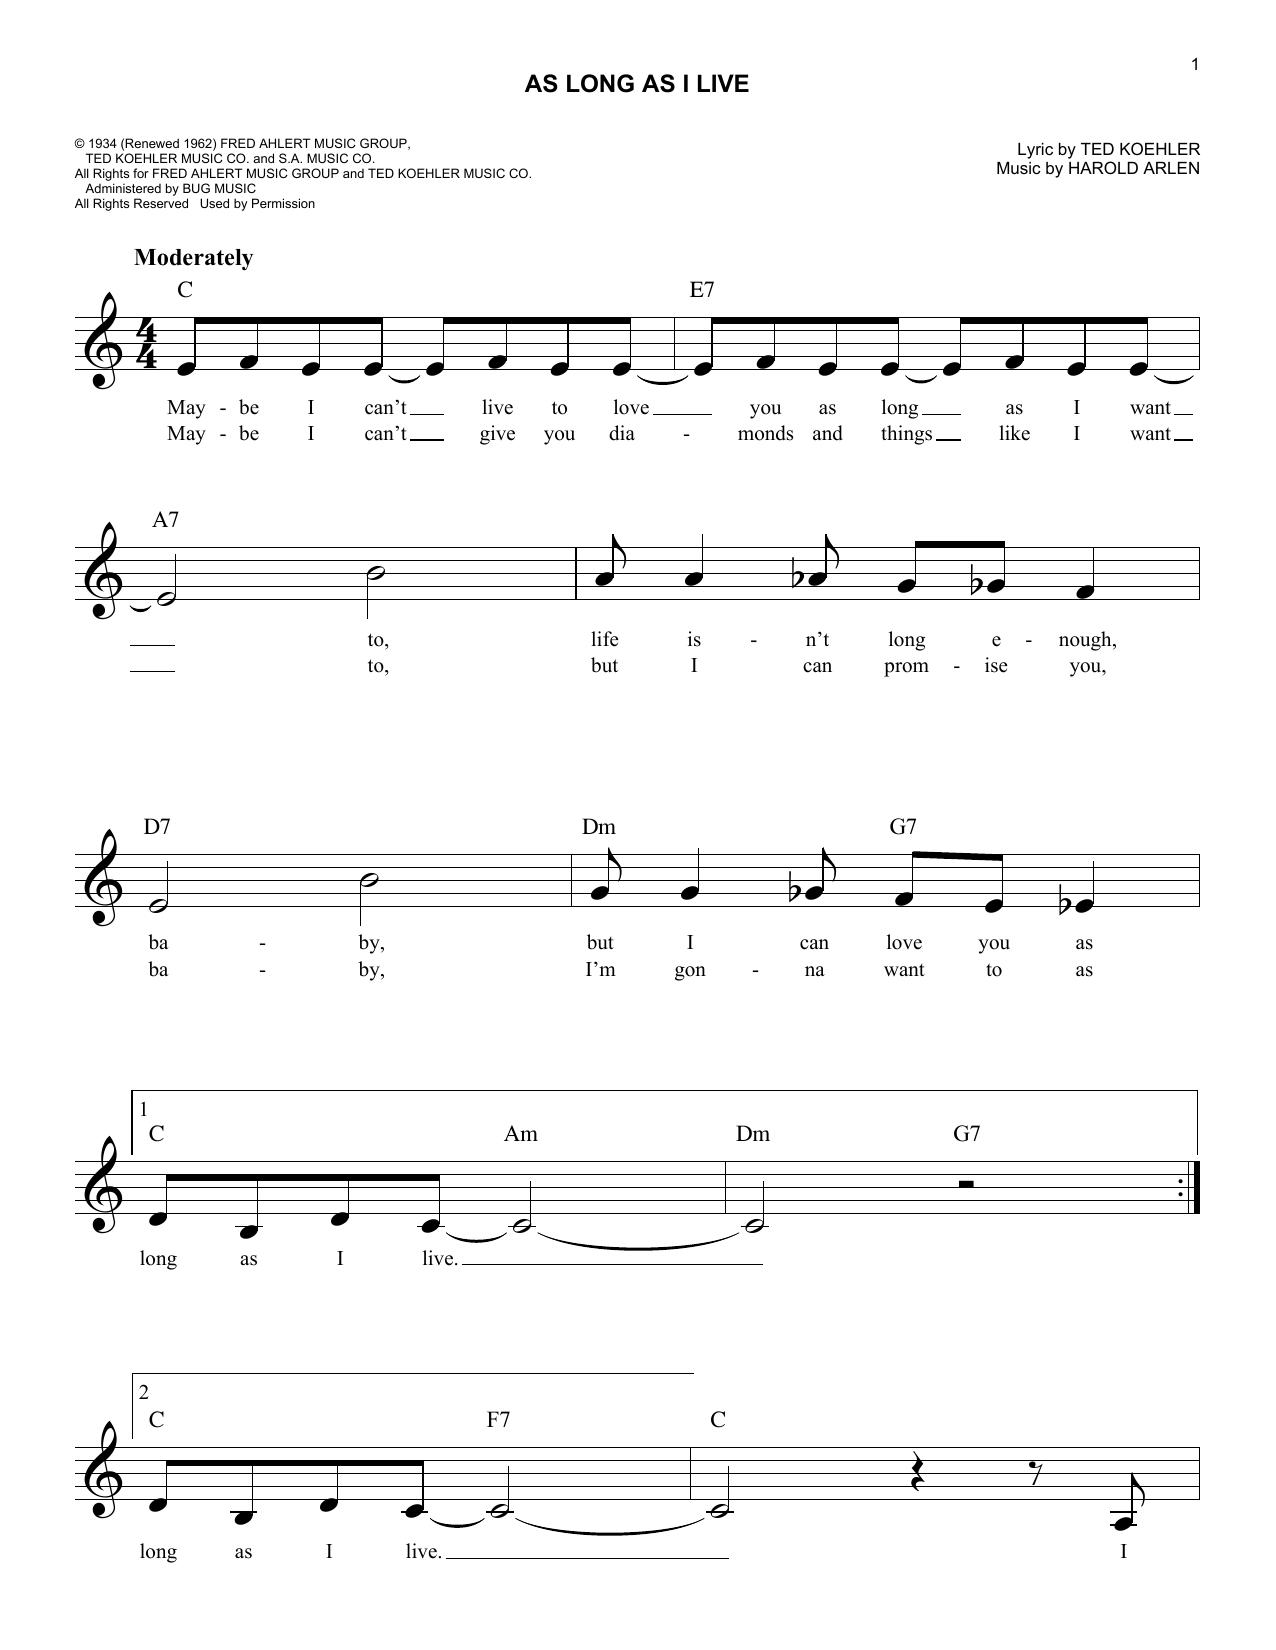 Harold Arlen As Long As I Live sheet music notes and chords. Download Printable PDF.